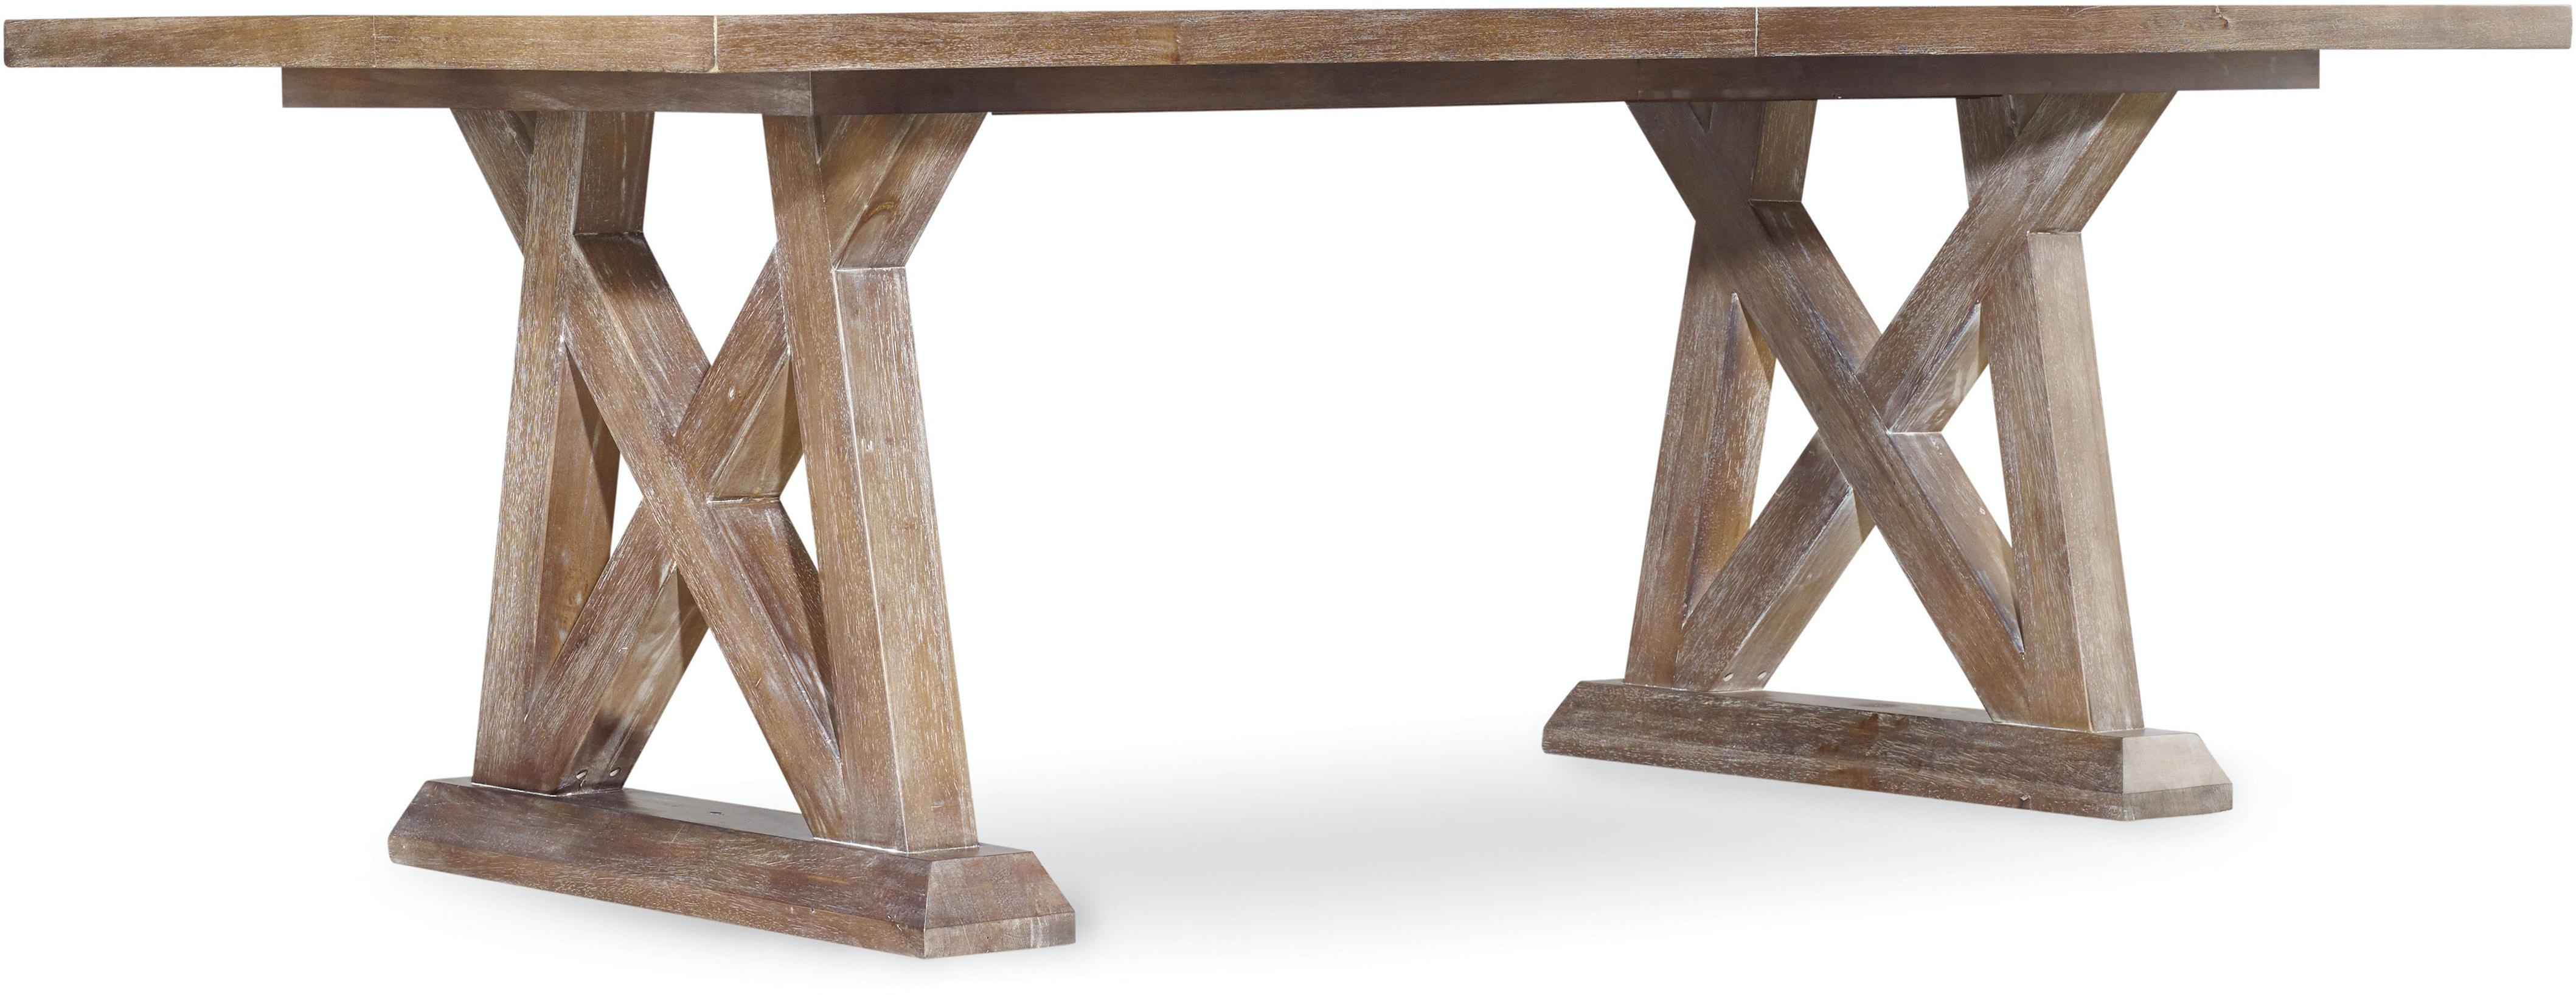 hooker furniture dining room studio 7h geo trestle dining table hooker furniture studio 7h geo trestle dining table 5382 75207